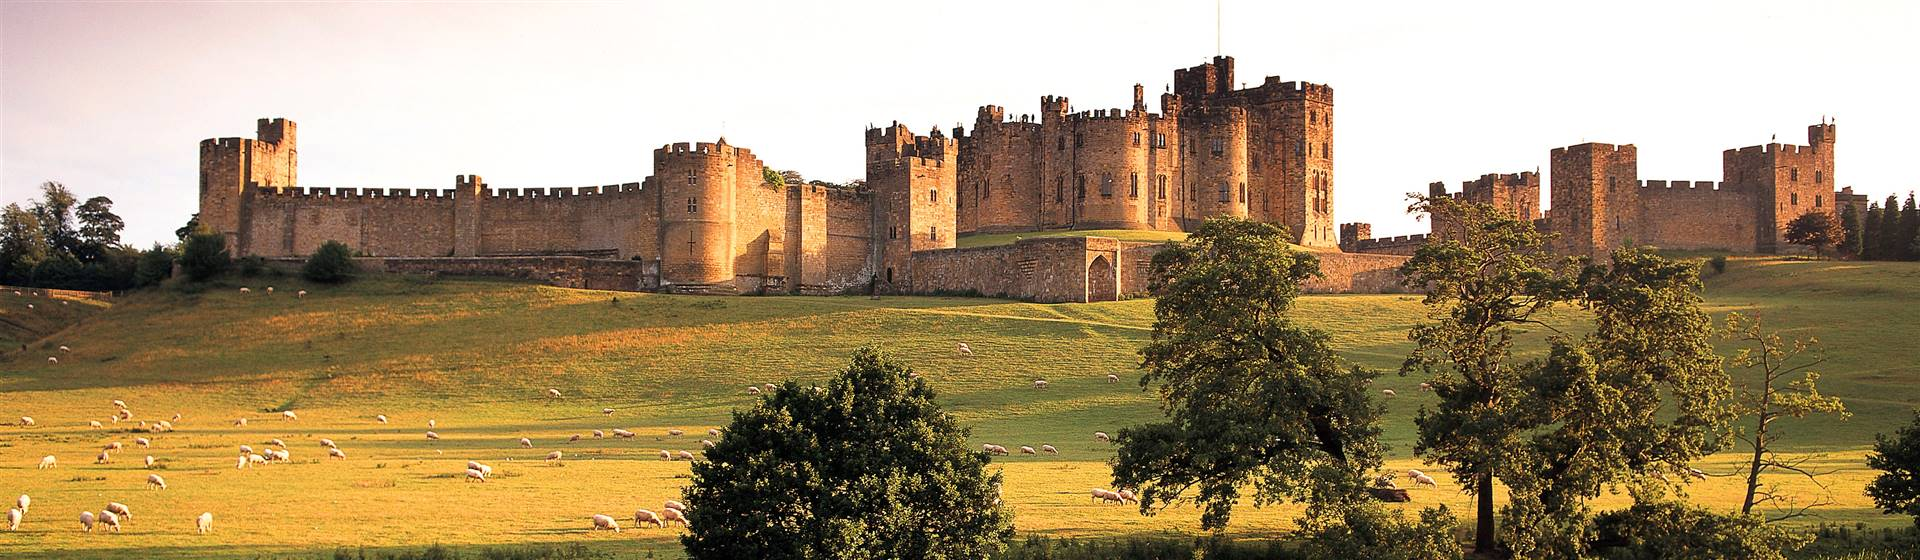 Alnwick Castle - Northumberland Tourism